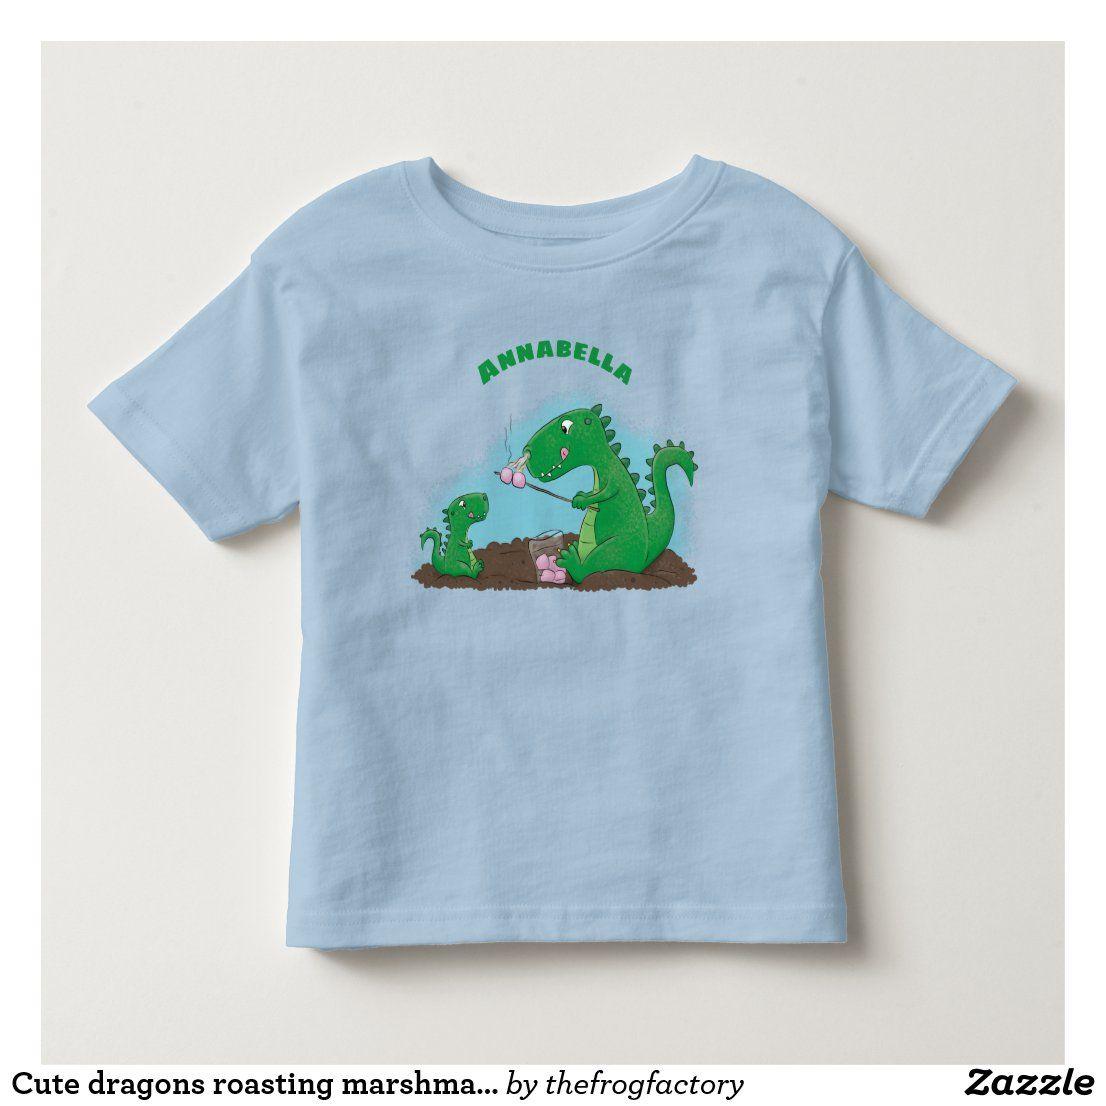 Cute Dragons Roasting Marshmallows Cartoon Toddler T Shirt Zazzle Com Toddler Tshirts Cute Dragons Custom Holiday Card